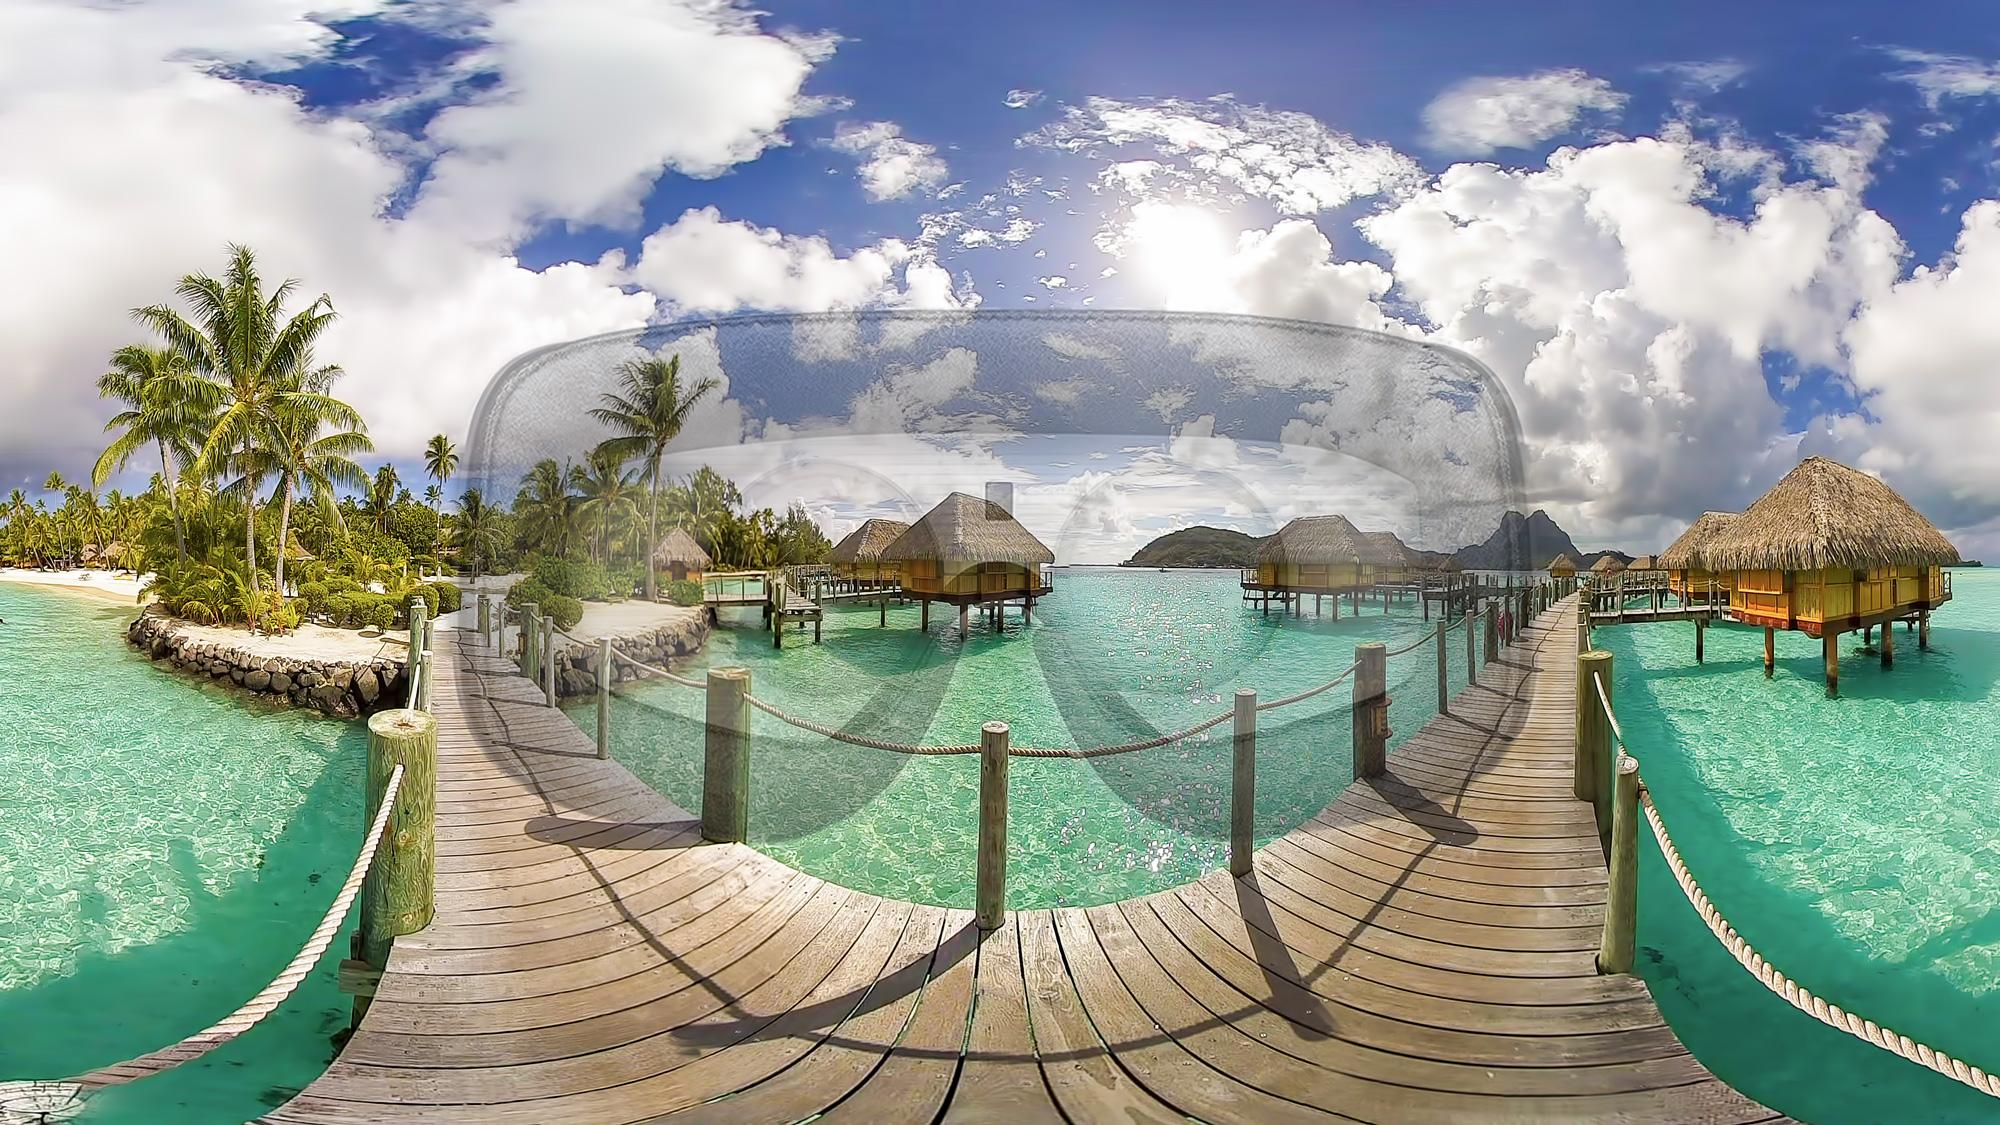 Superswell VR Homepage-Tahiti Bora Bora Overwater Bungalows_Portland Virtual Reality Company.jpg.jpg